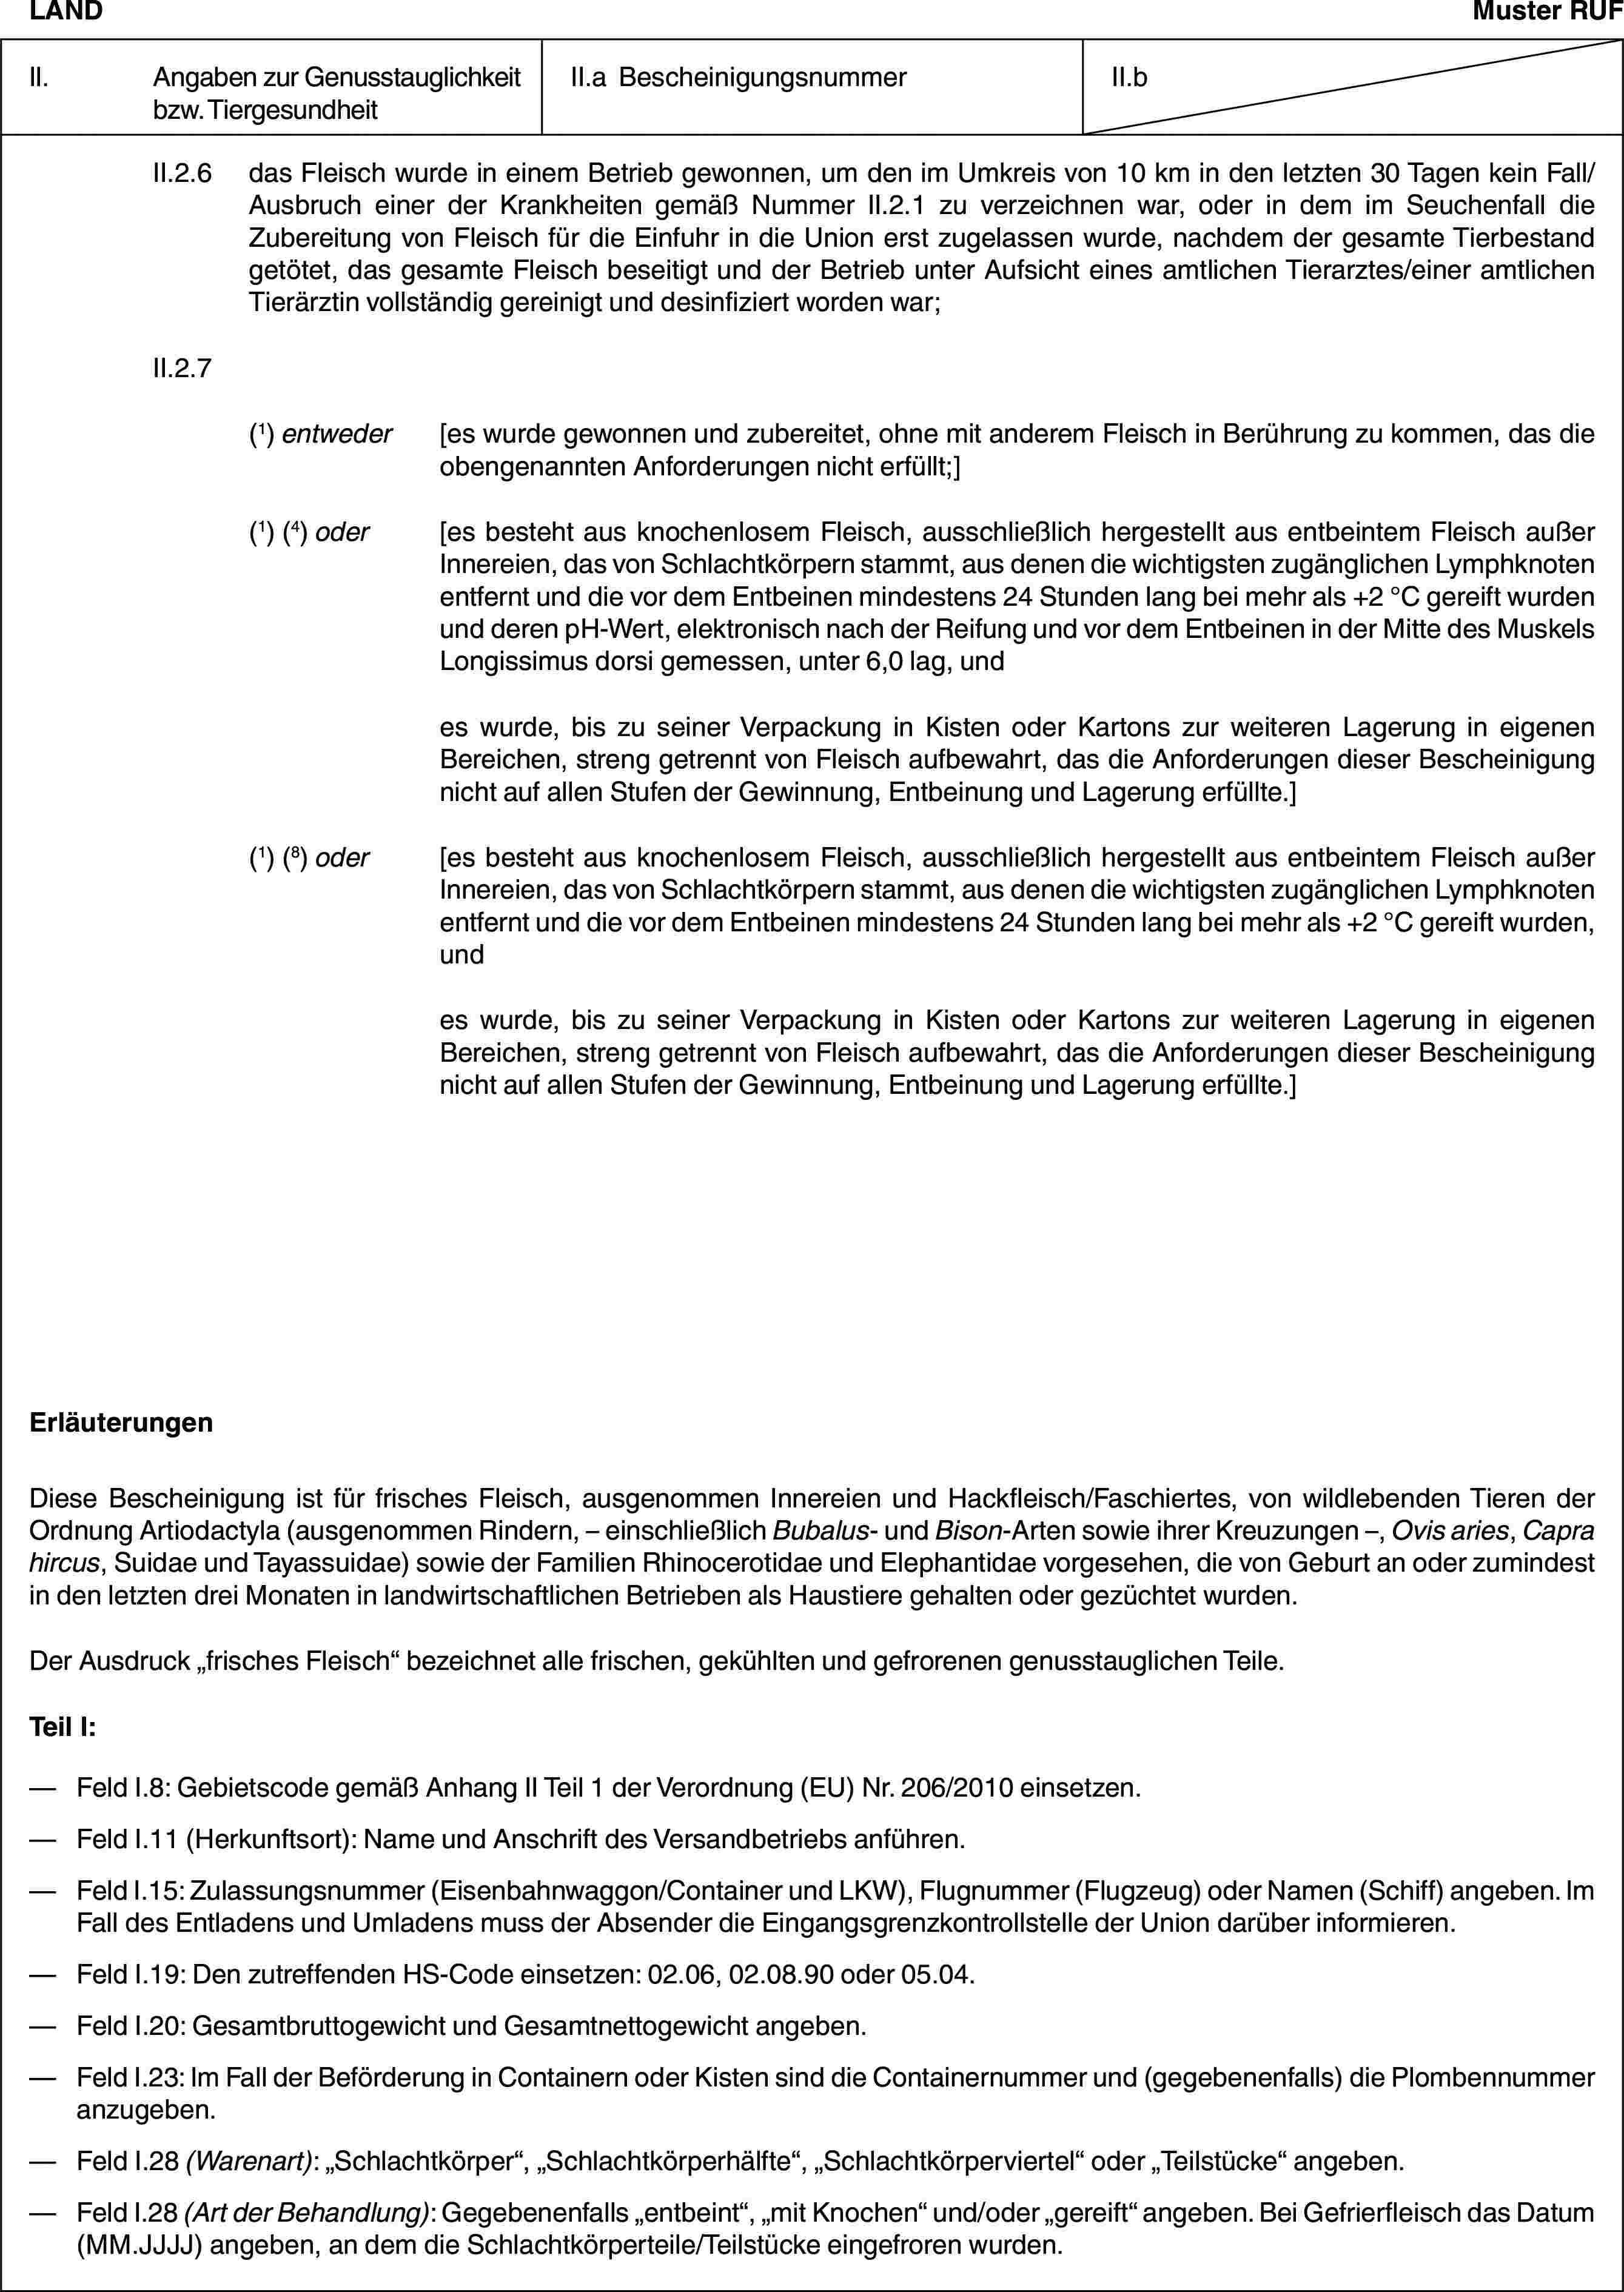 EUR-Lex - 02010R0206-20110310 - EN - EUR-Lex